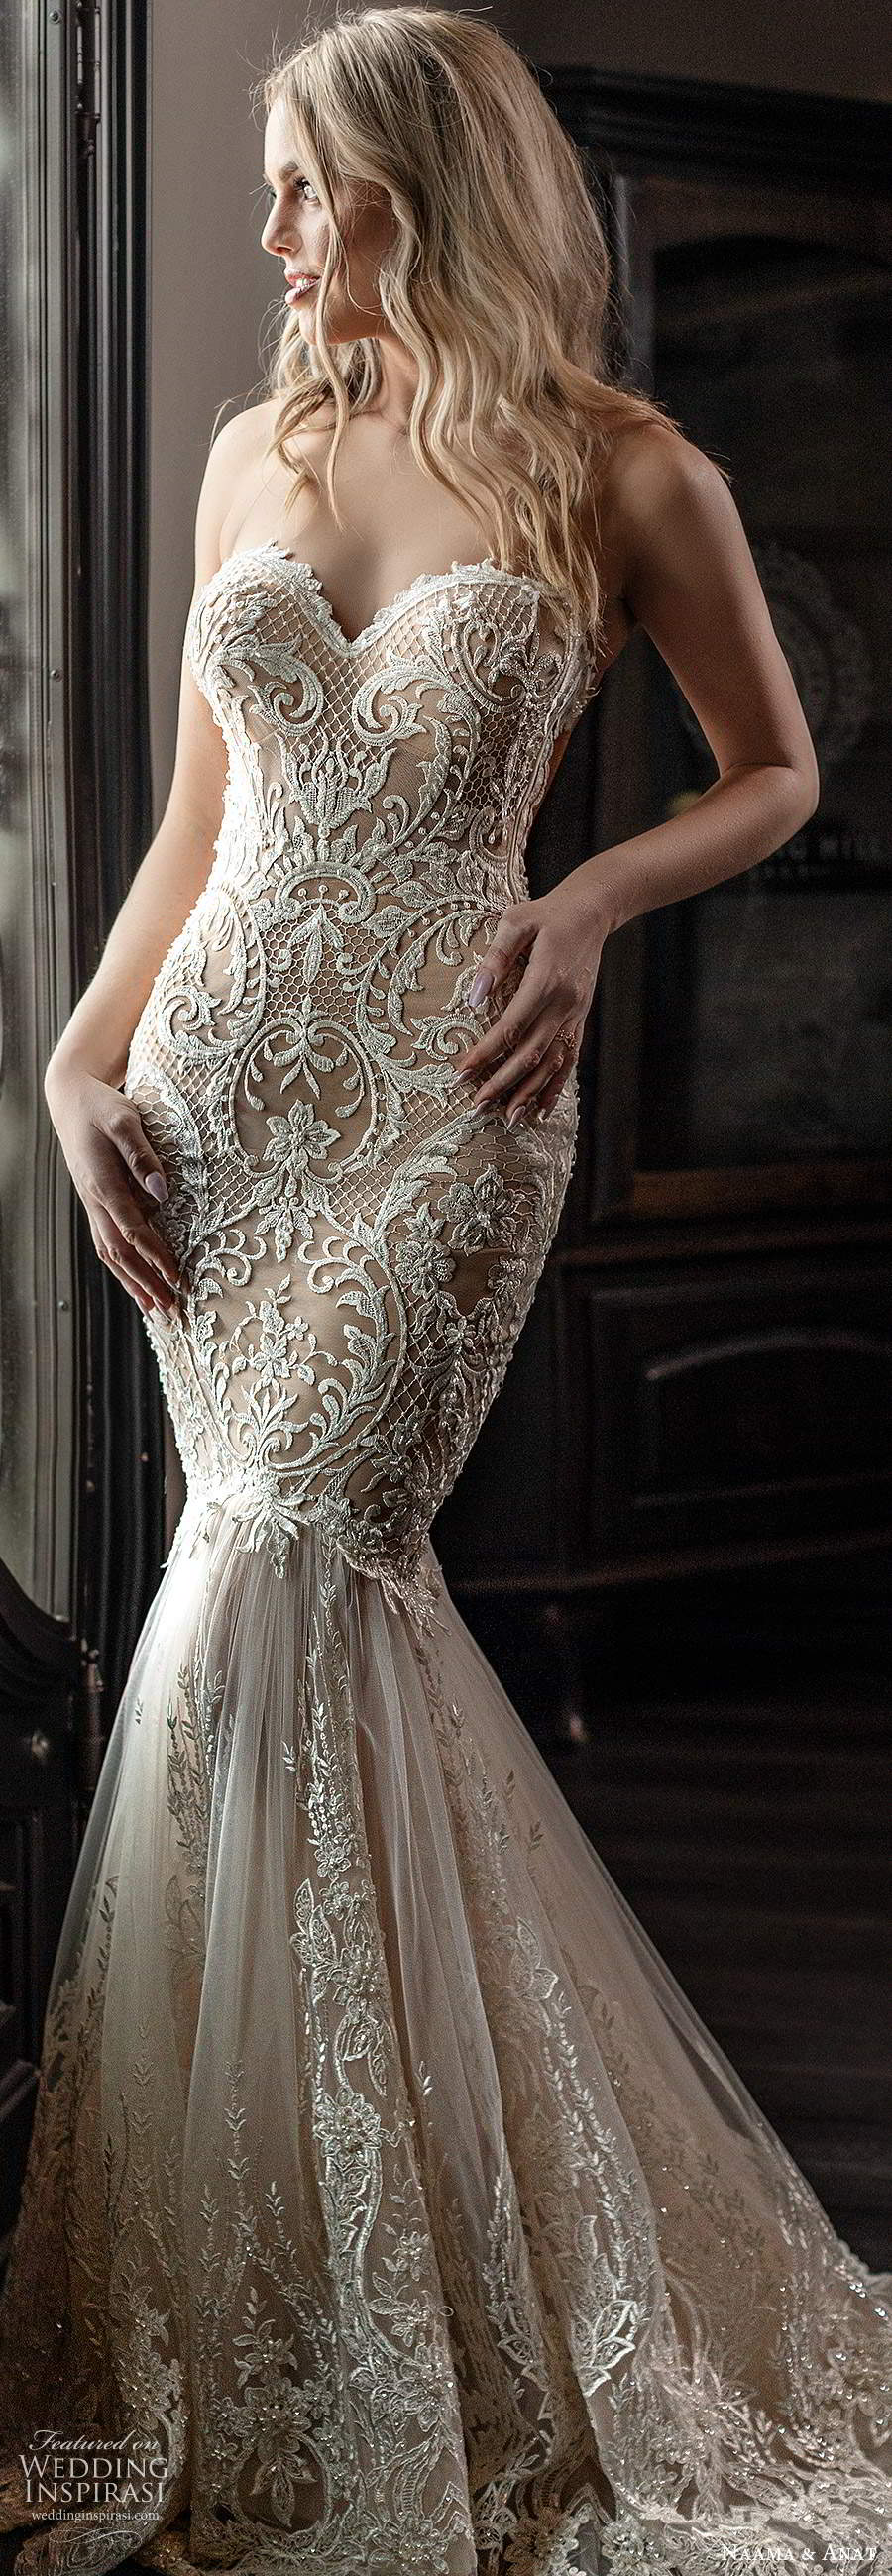 naama anat spring 2020 knottinghill bridal strapless sweetheart neckline fully embellished lace fit flare mermaid elegant wedding dress chapel train (1) lv